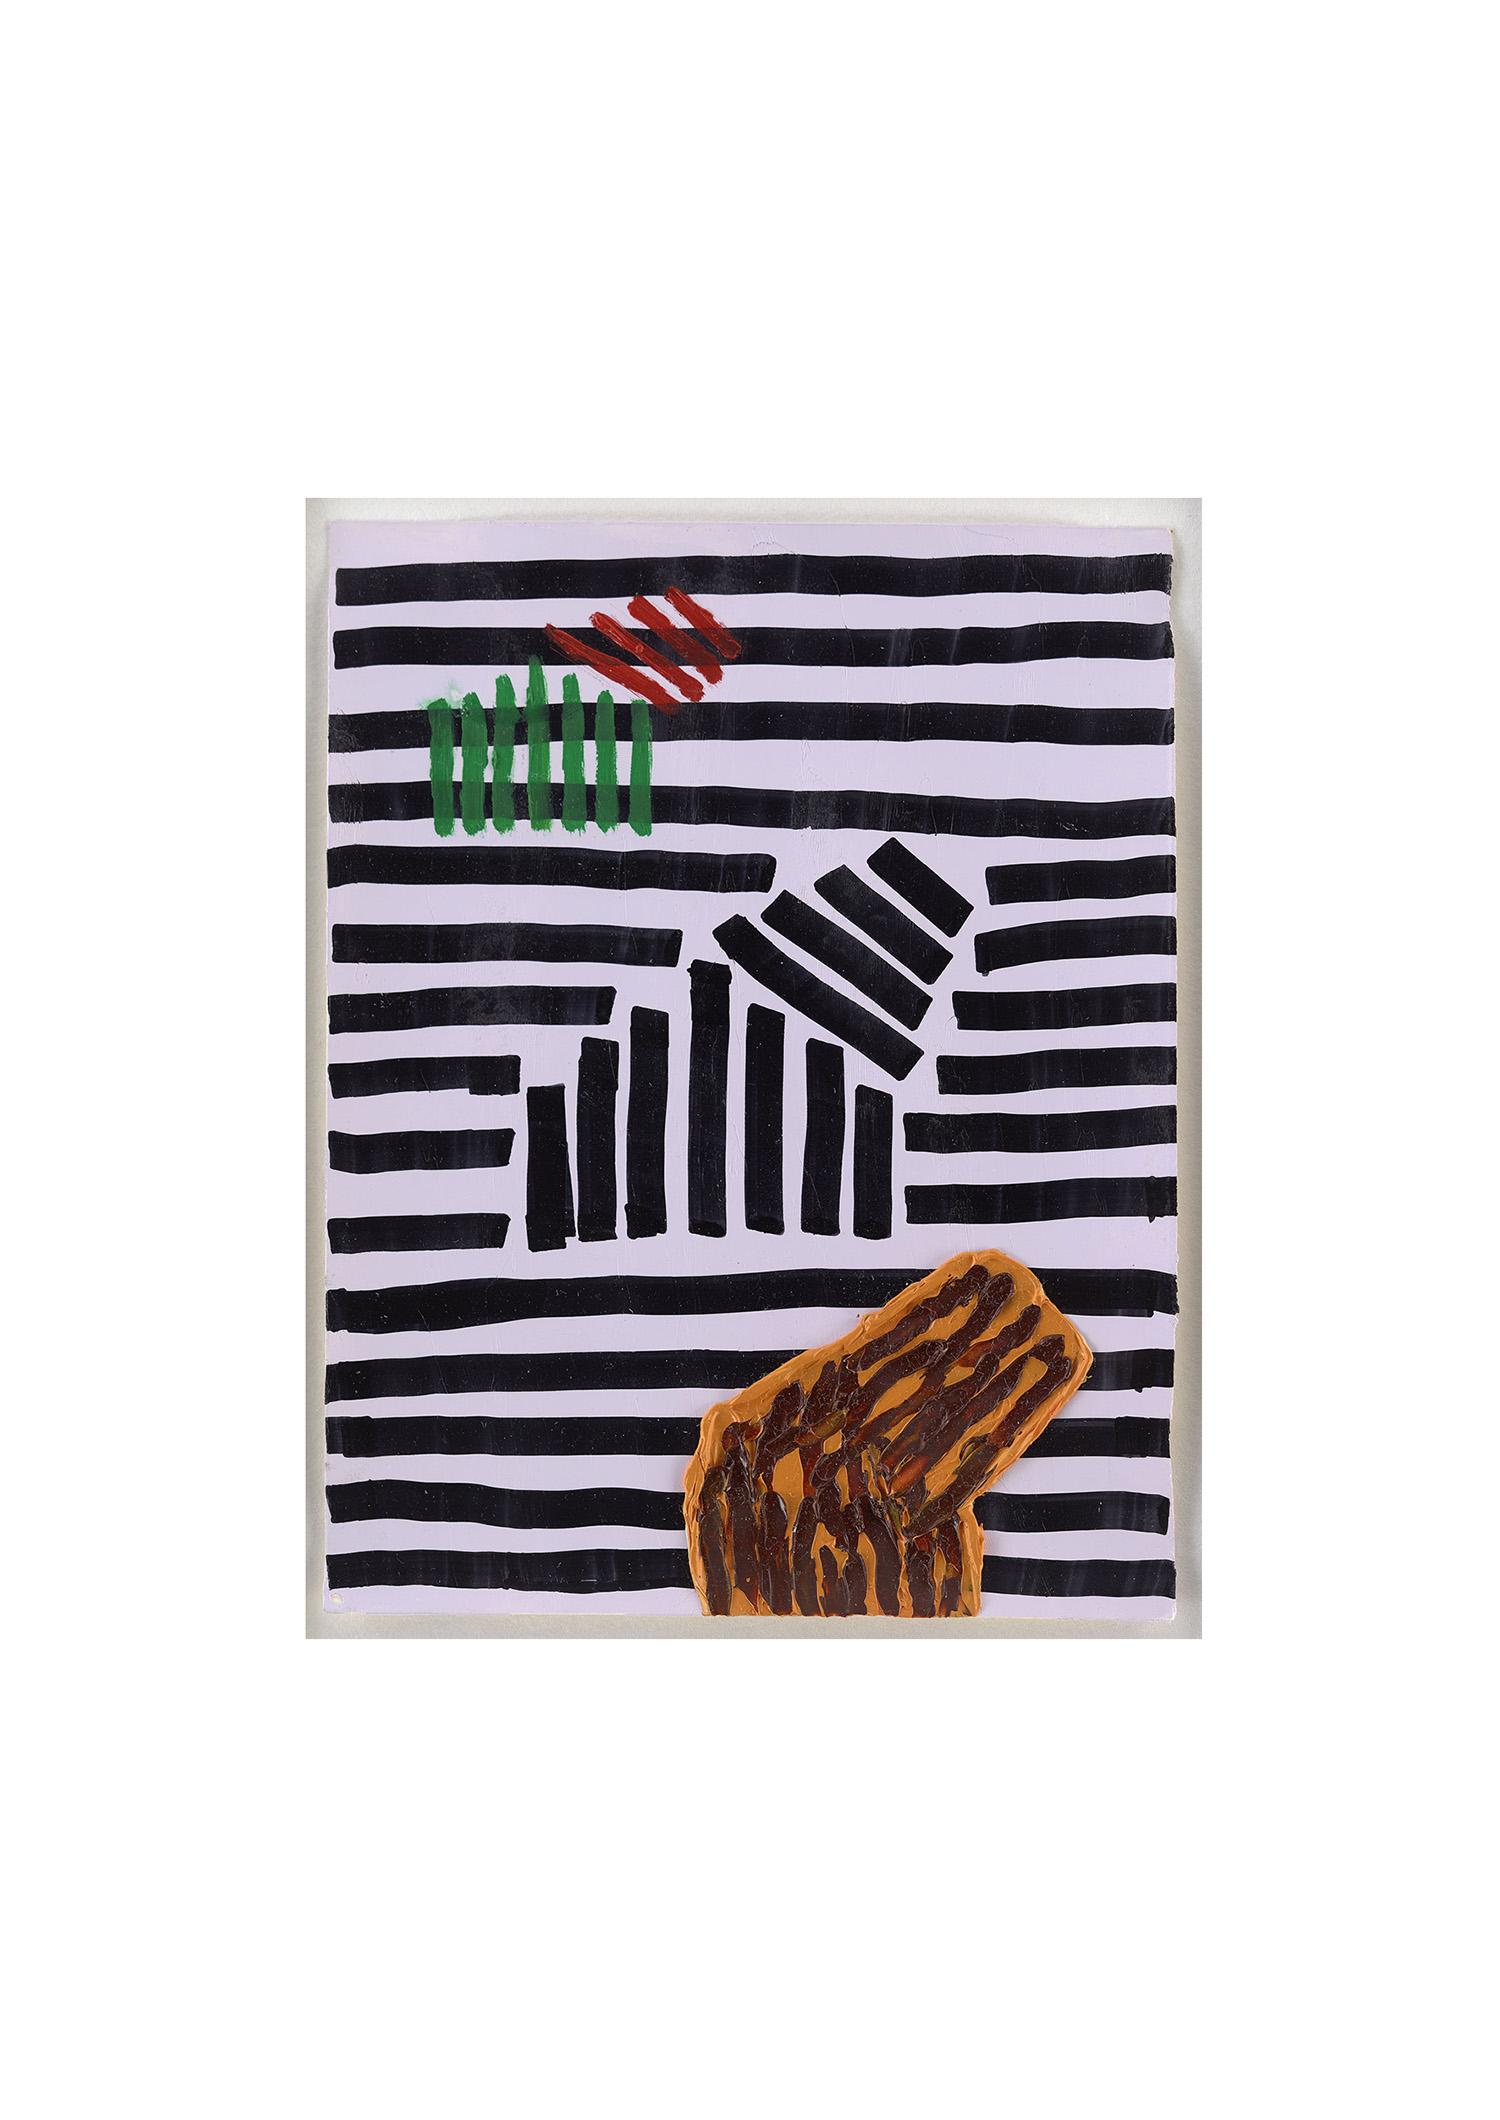 Things Are As They Seem | 1995 | Mischtechnik auf Papier | 12 x 15 cm